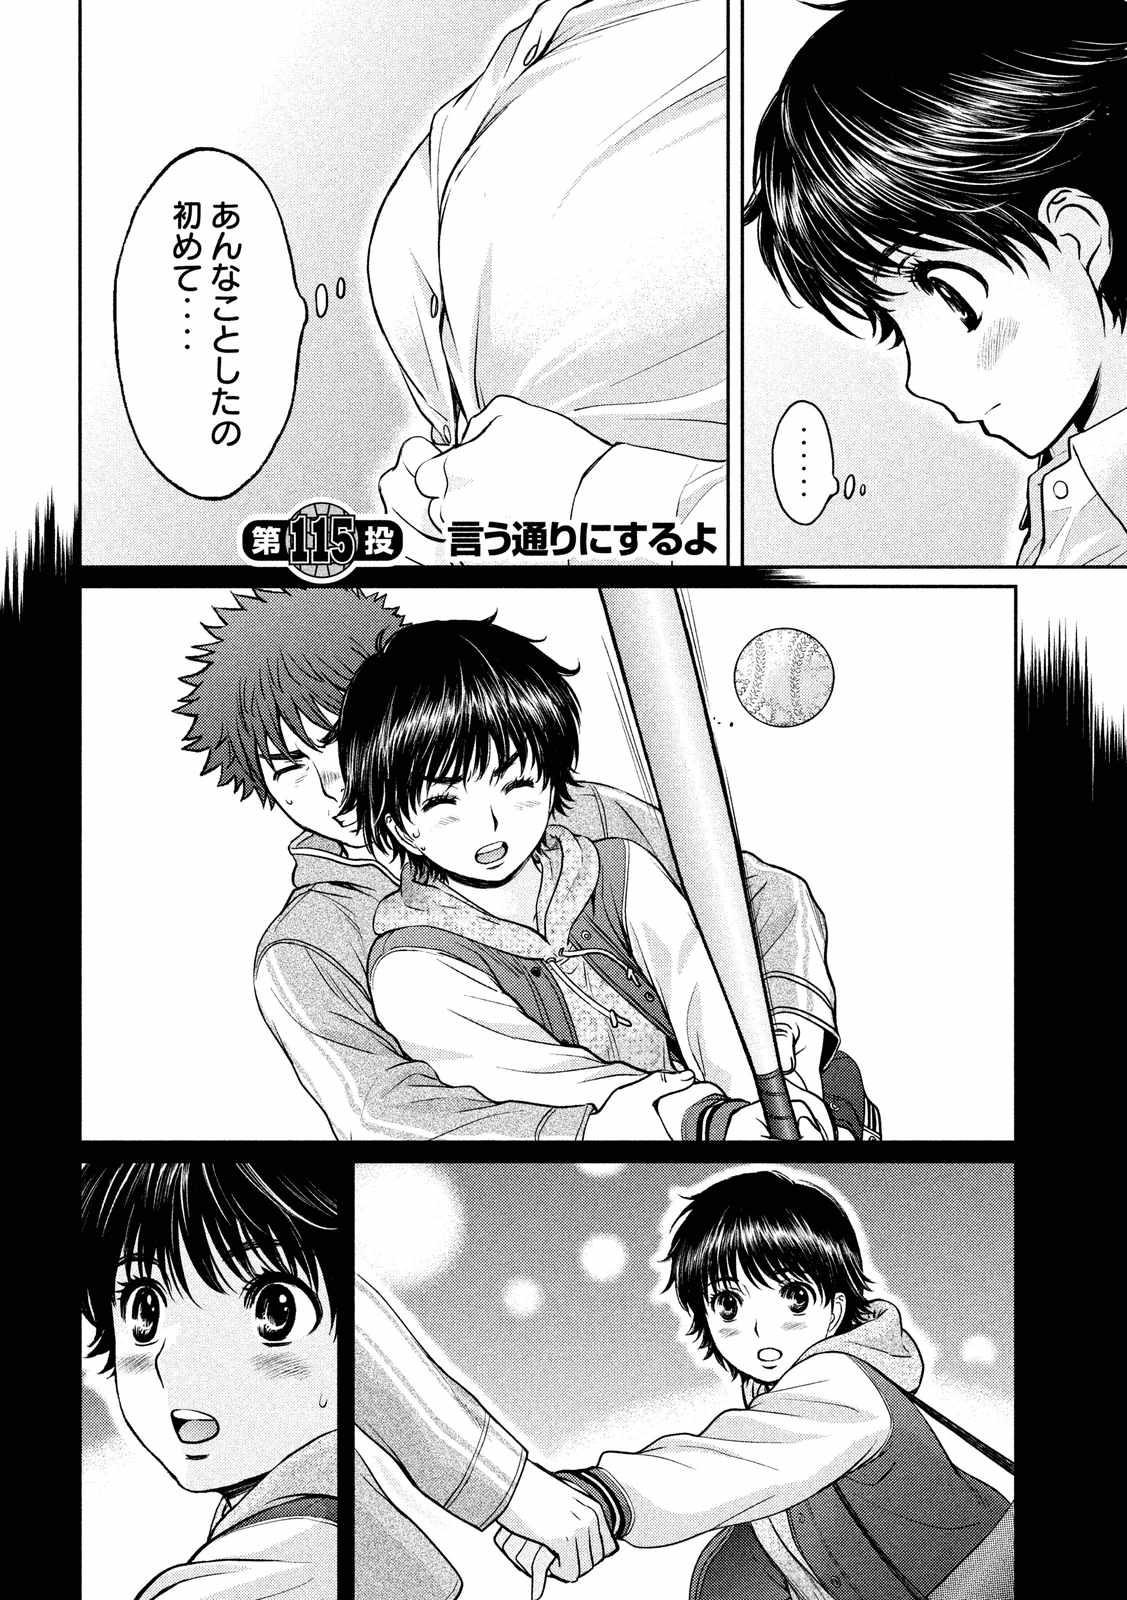 Hantsu x Trash - Chapter 115 - Page 2